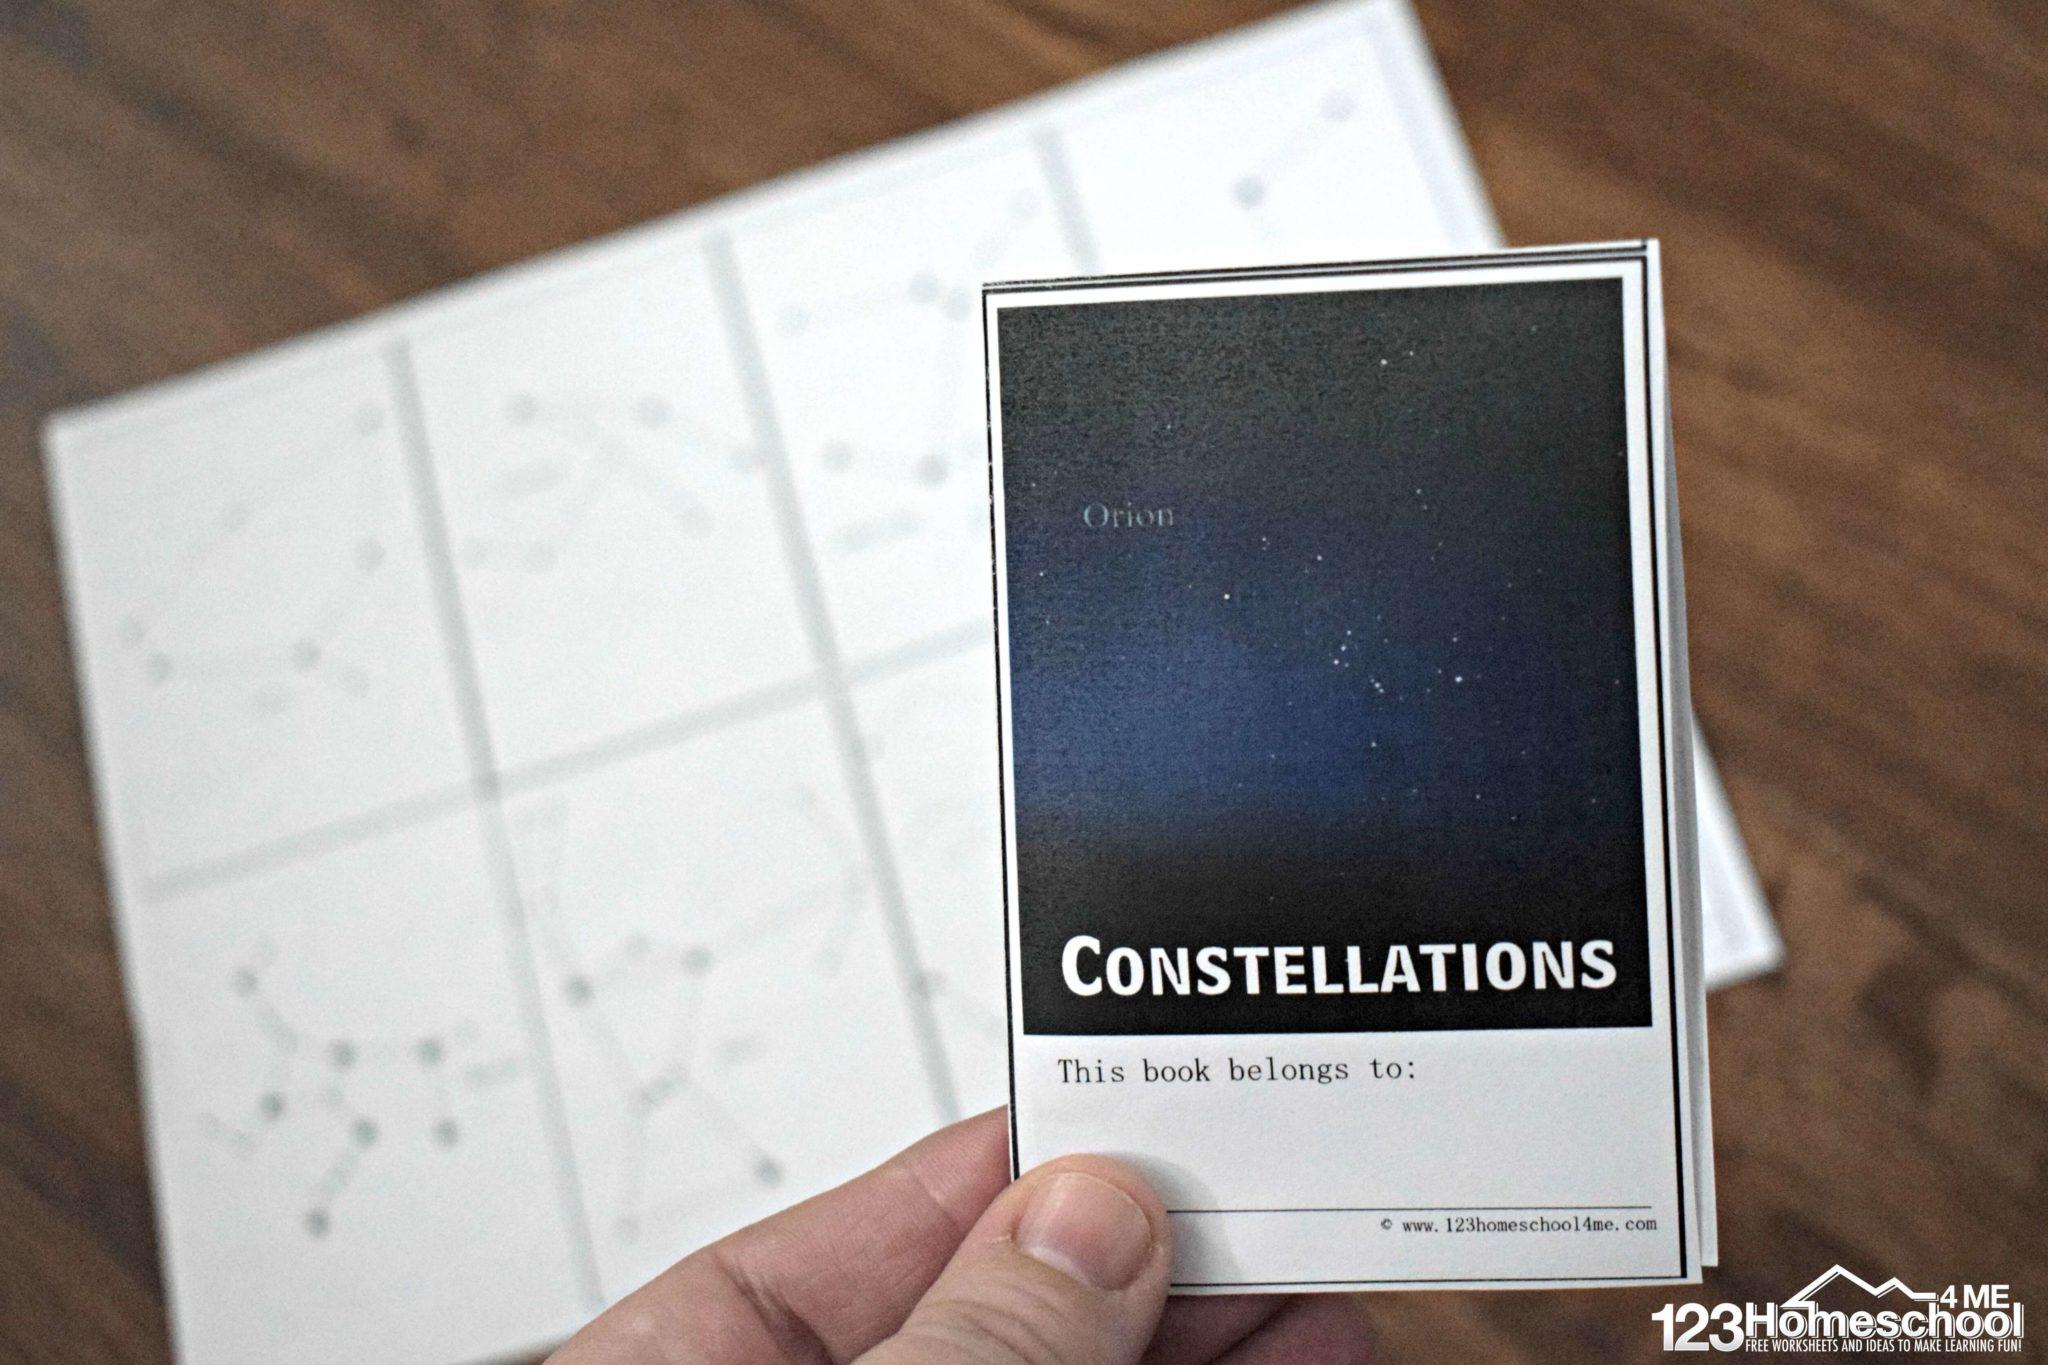 Constellations Mini Book 123 Homeschool 4 Me